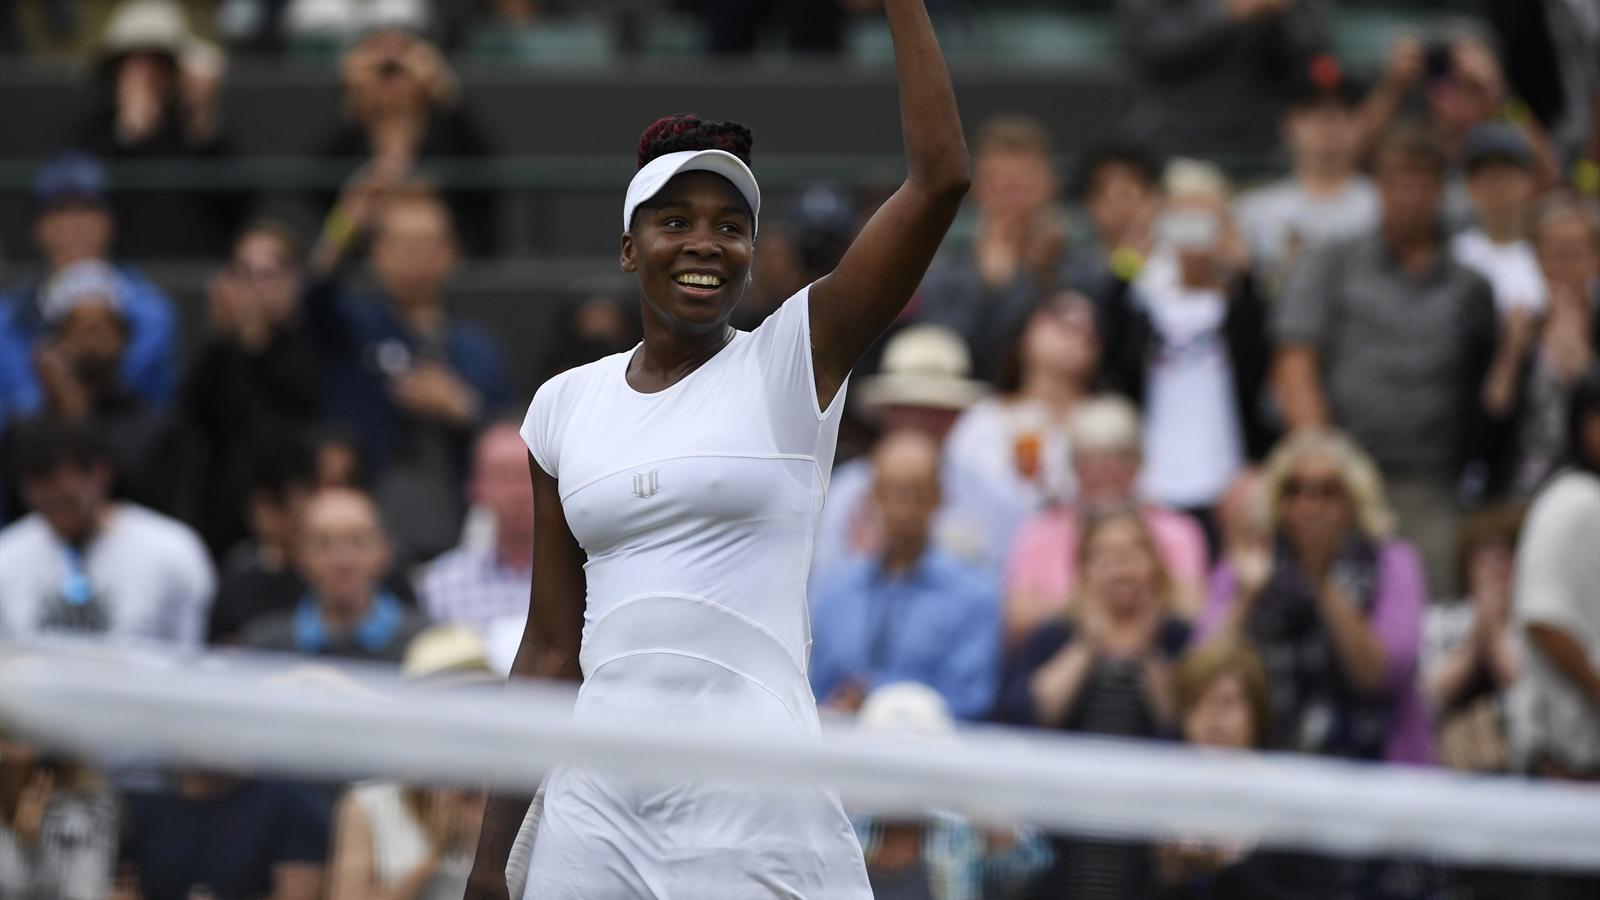 Venus Williams edges past Carla Suarez Navarro to reach last eight